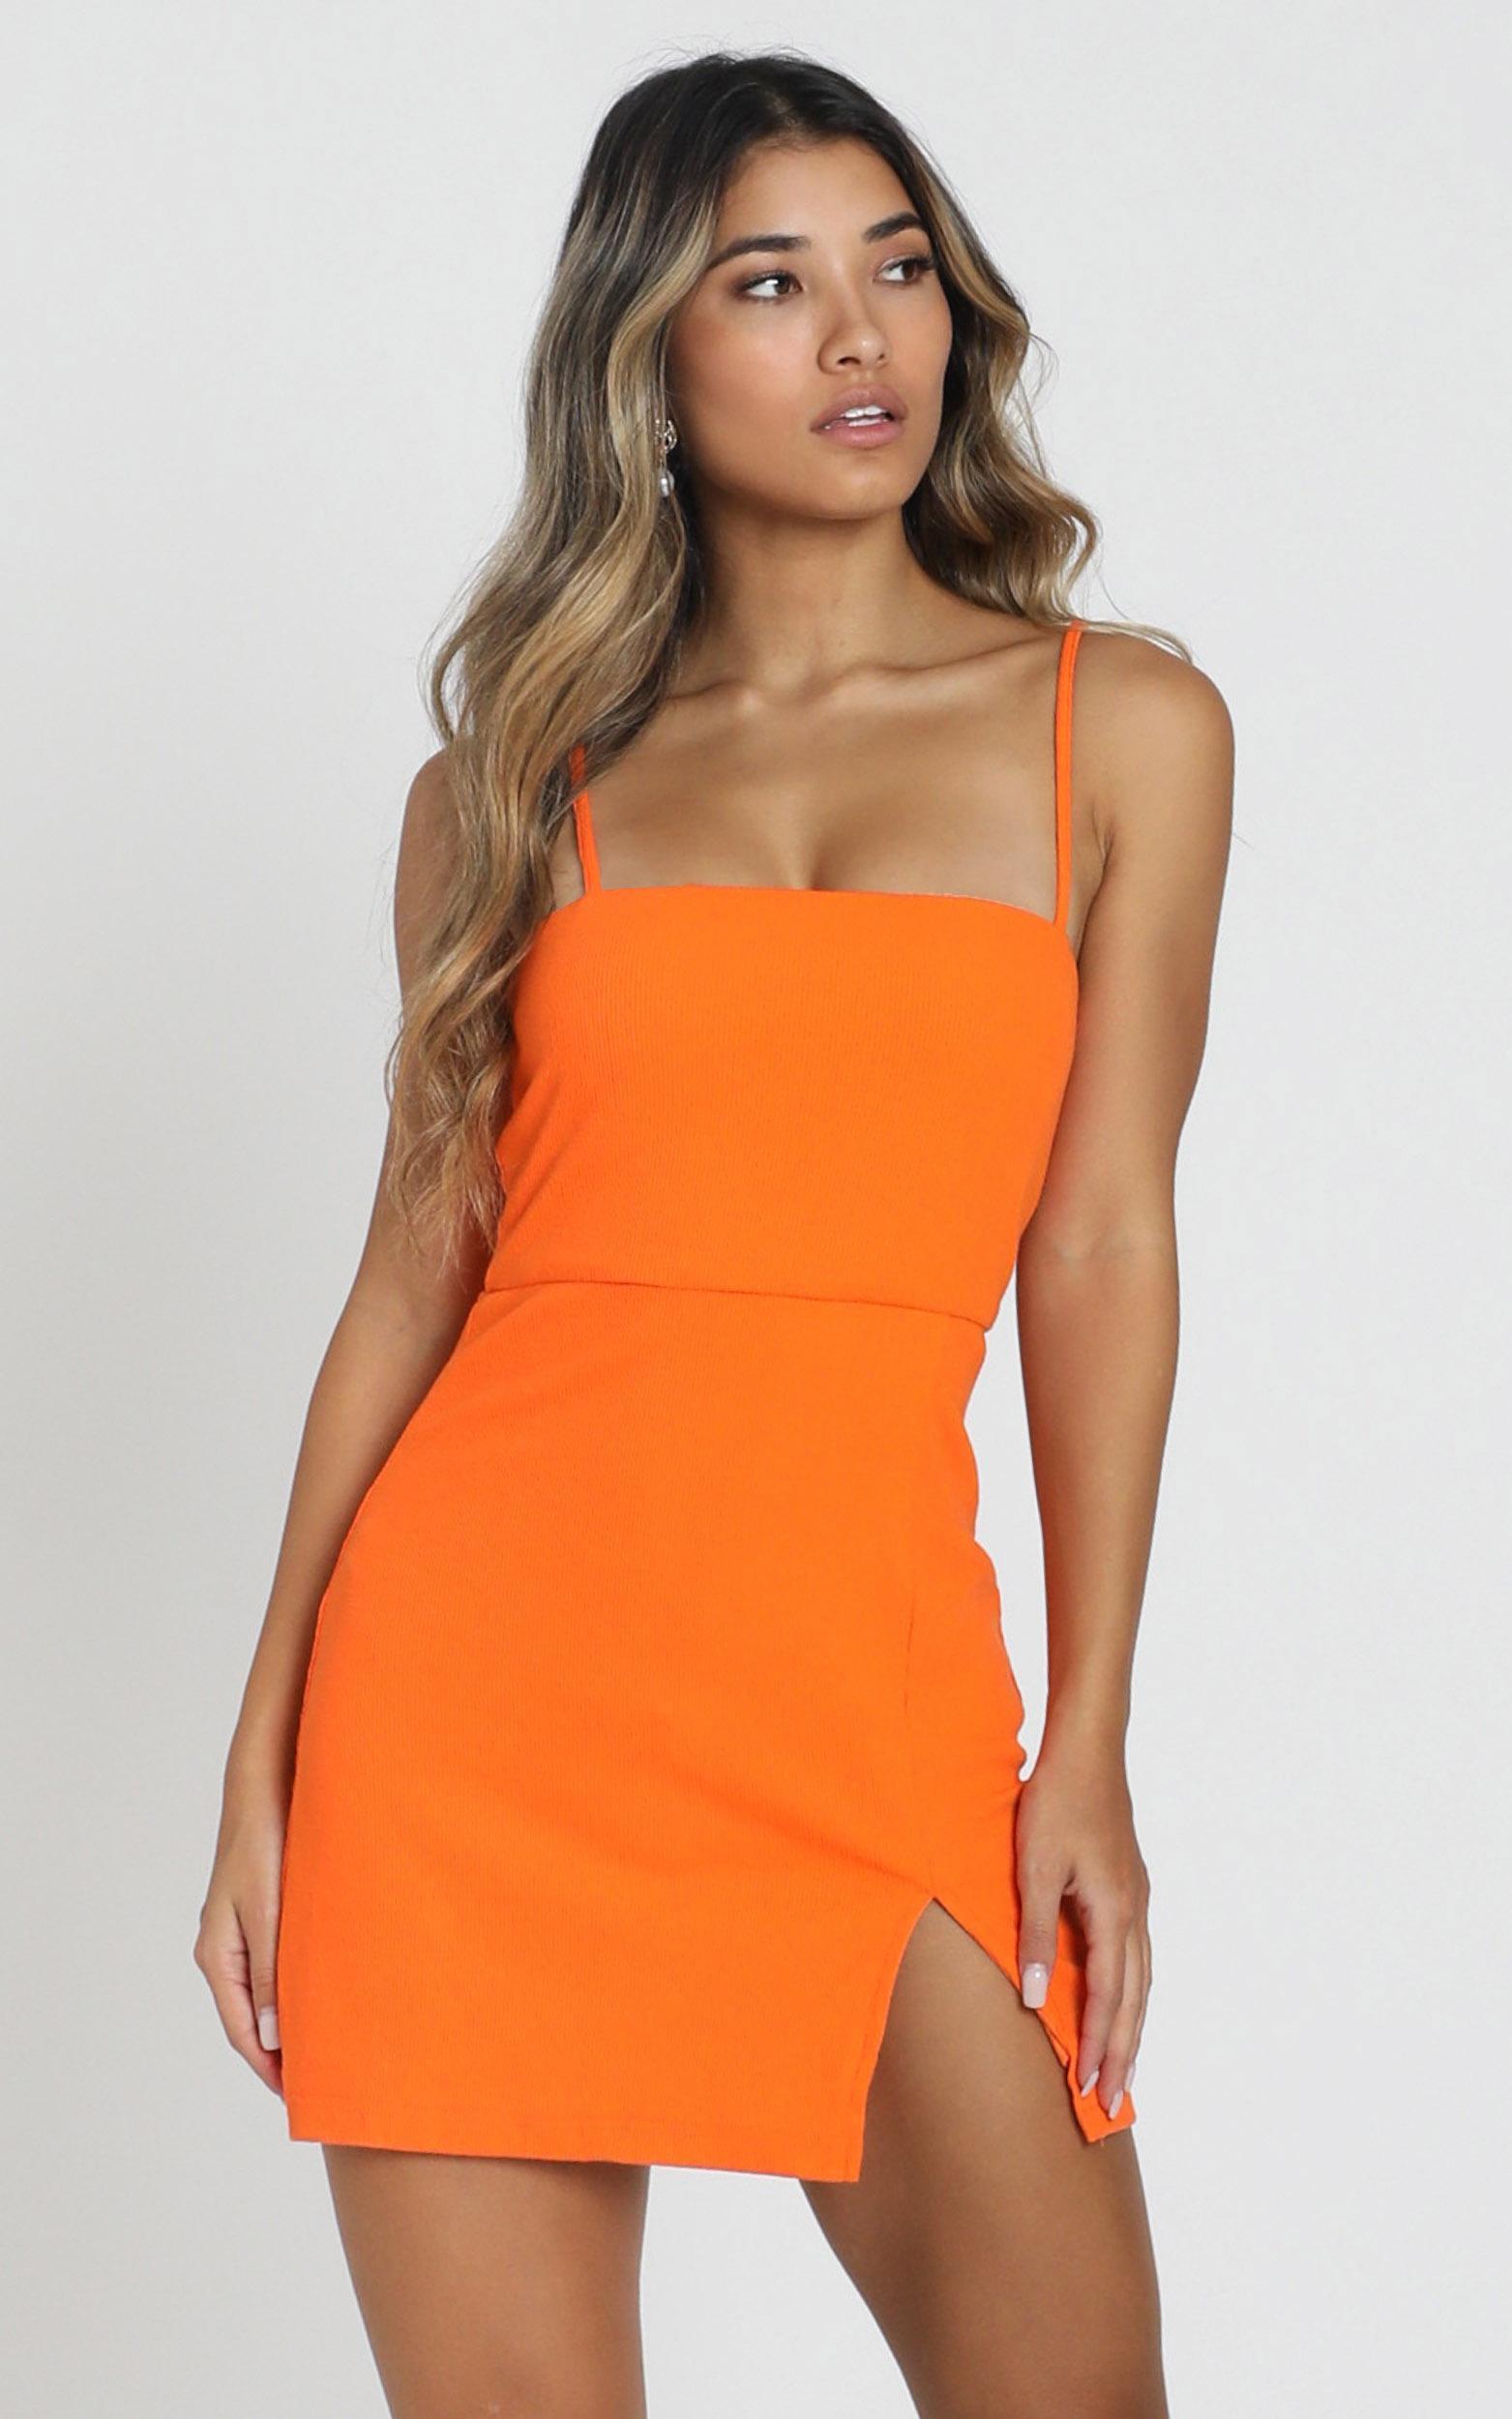 Island Babe Dress in orange - 6 (XS), Orange, hi-res image number null